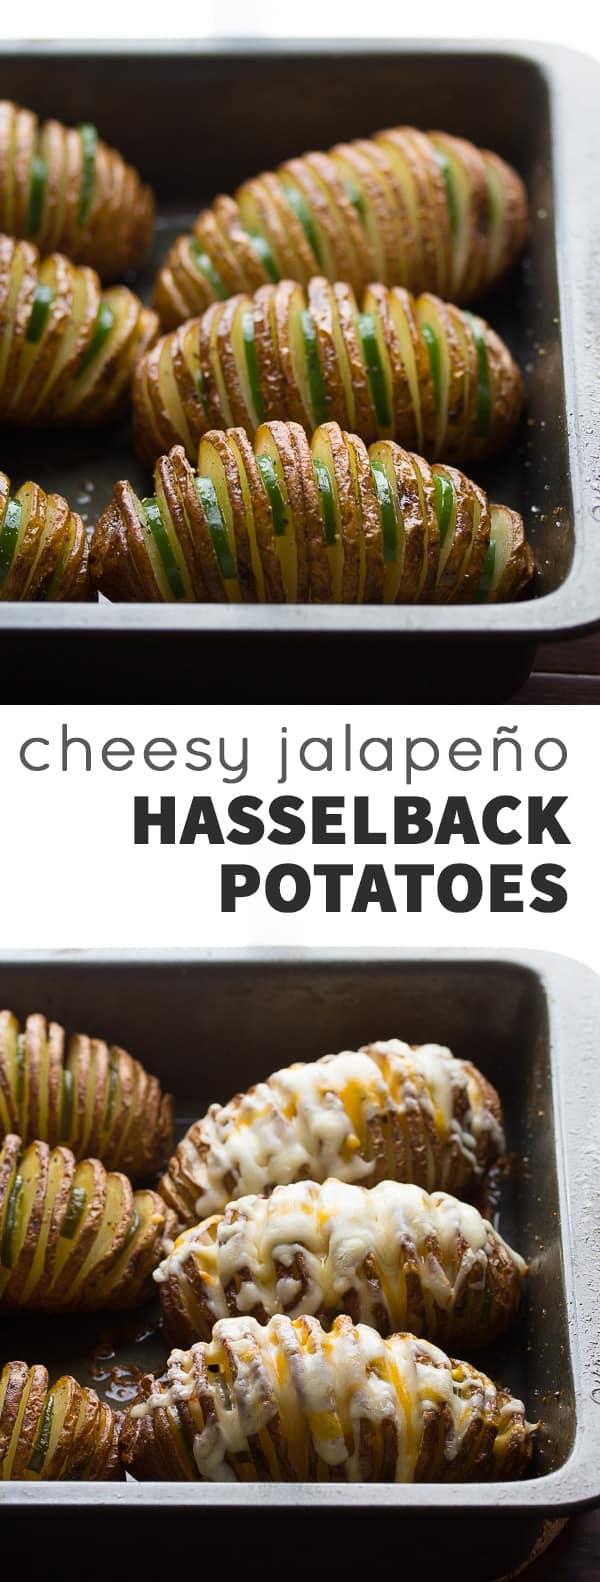 Cheesy Jalapeño Hasselback Potatoes with Avocado Cream Sauce | @sweetpeasaffron